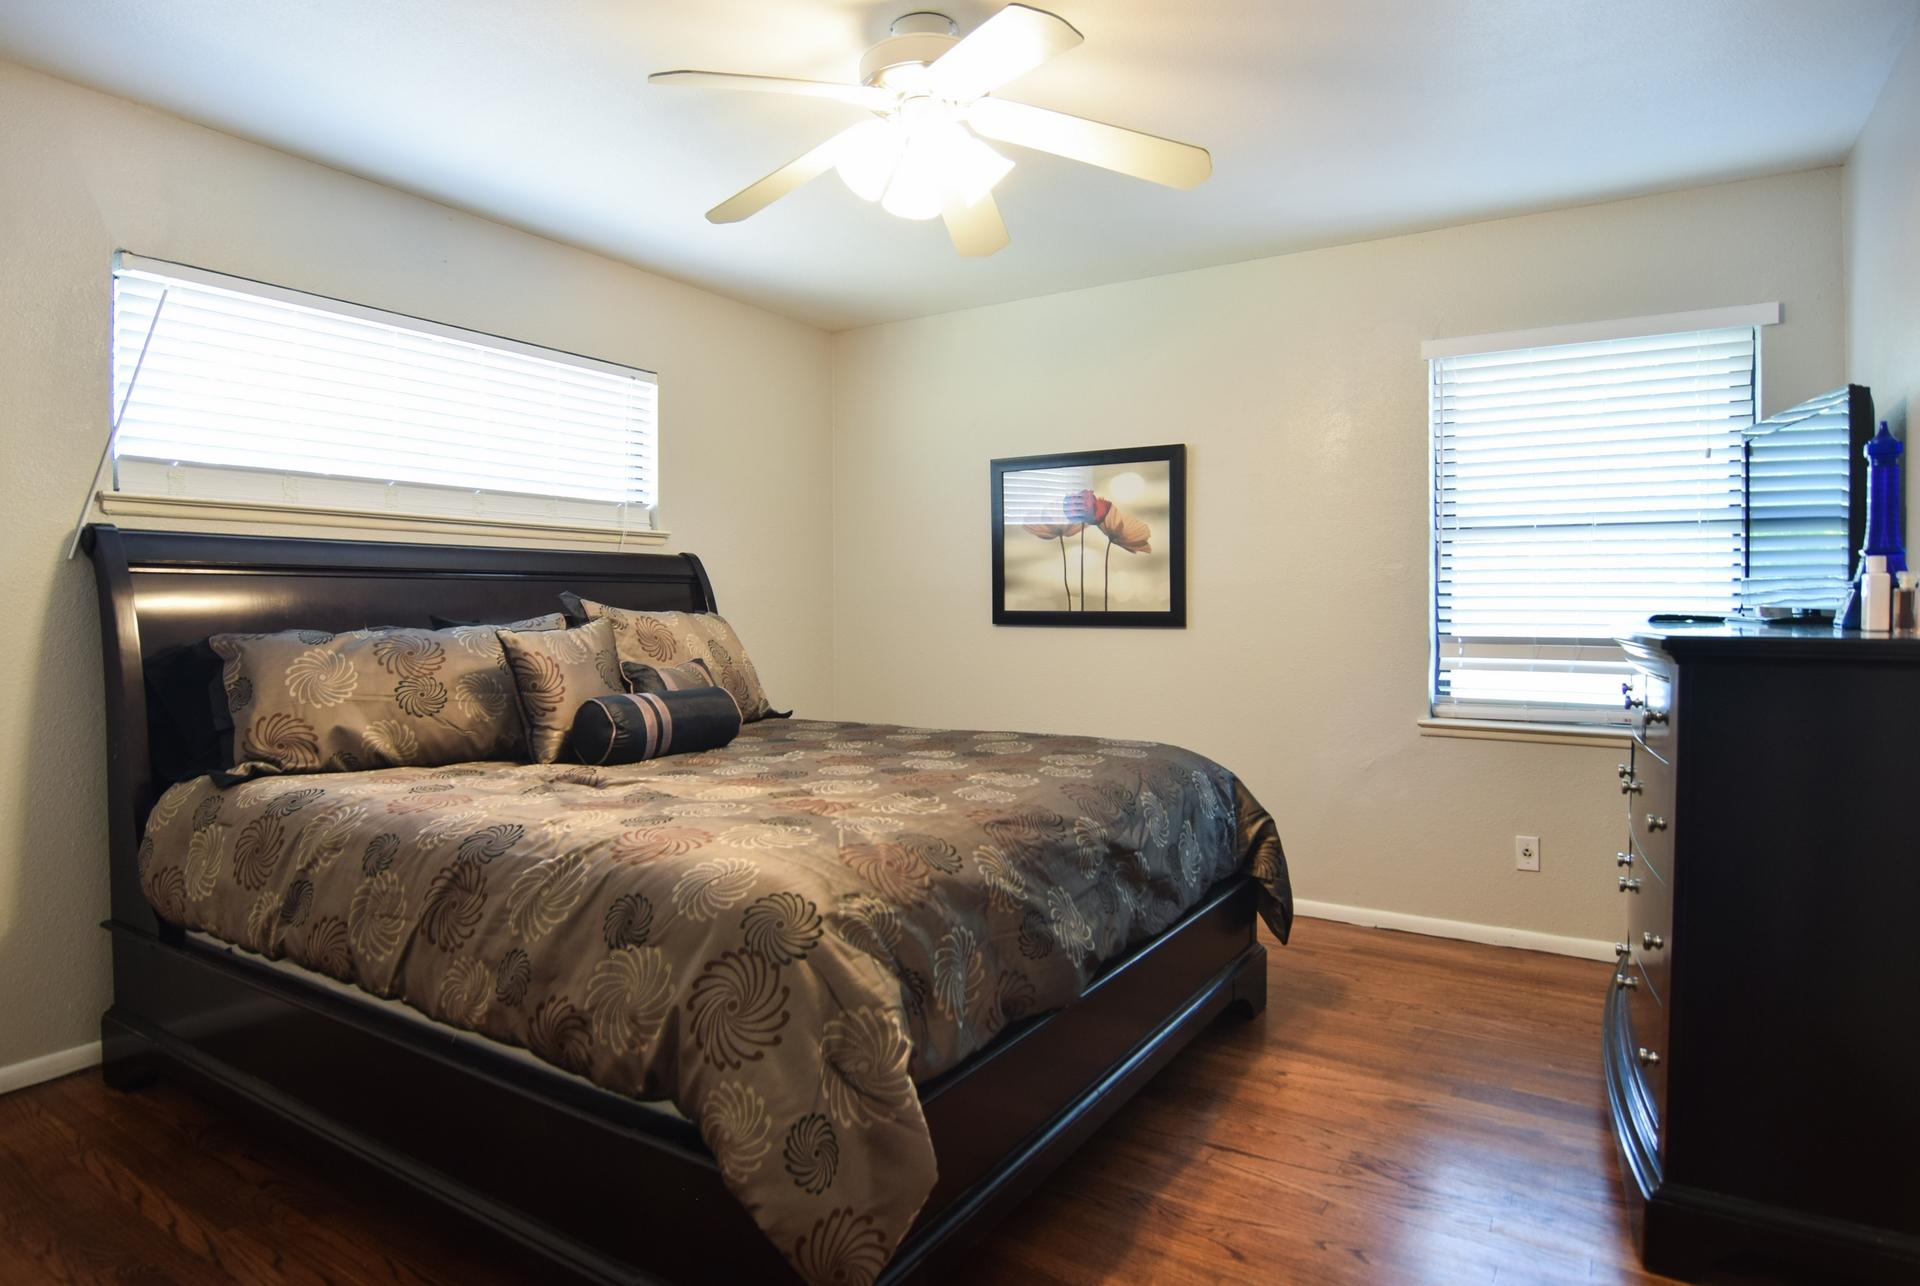 Bed1 3112 Catamore Dr Dallas TX 75229.jpg